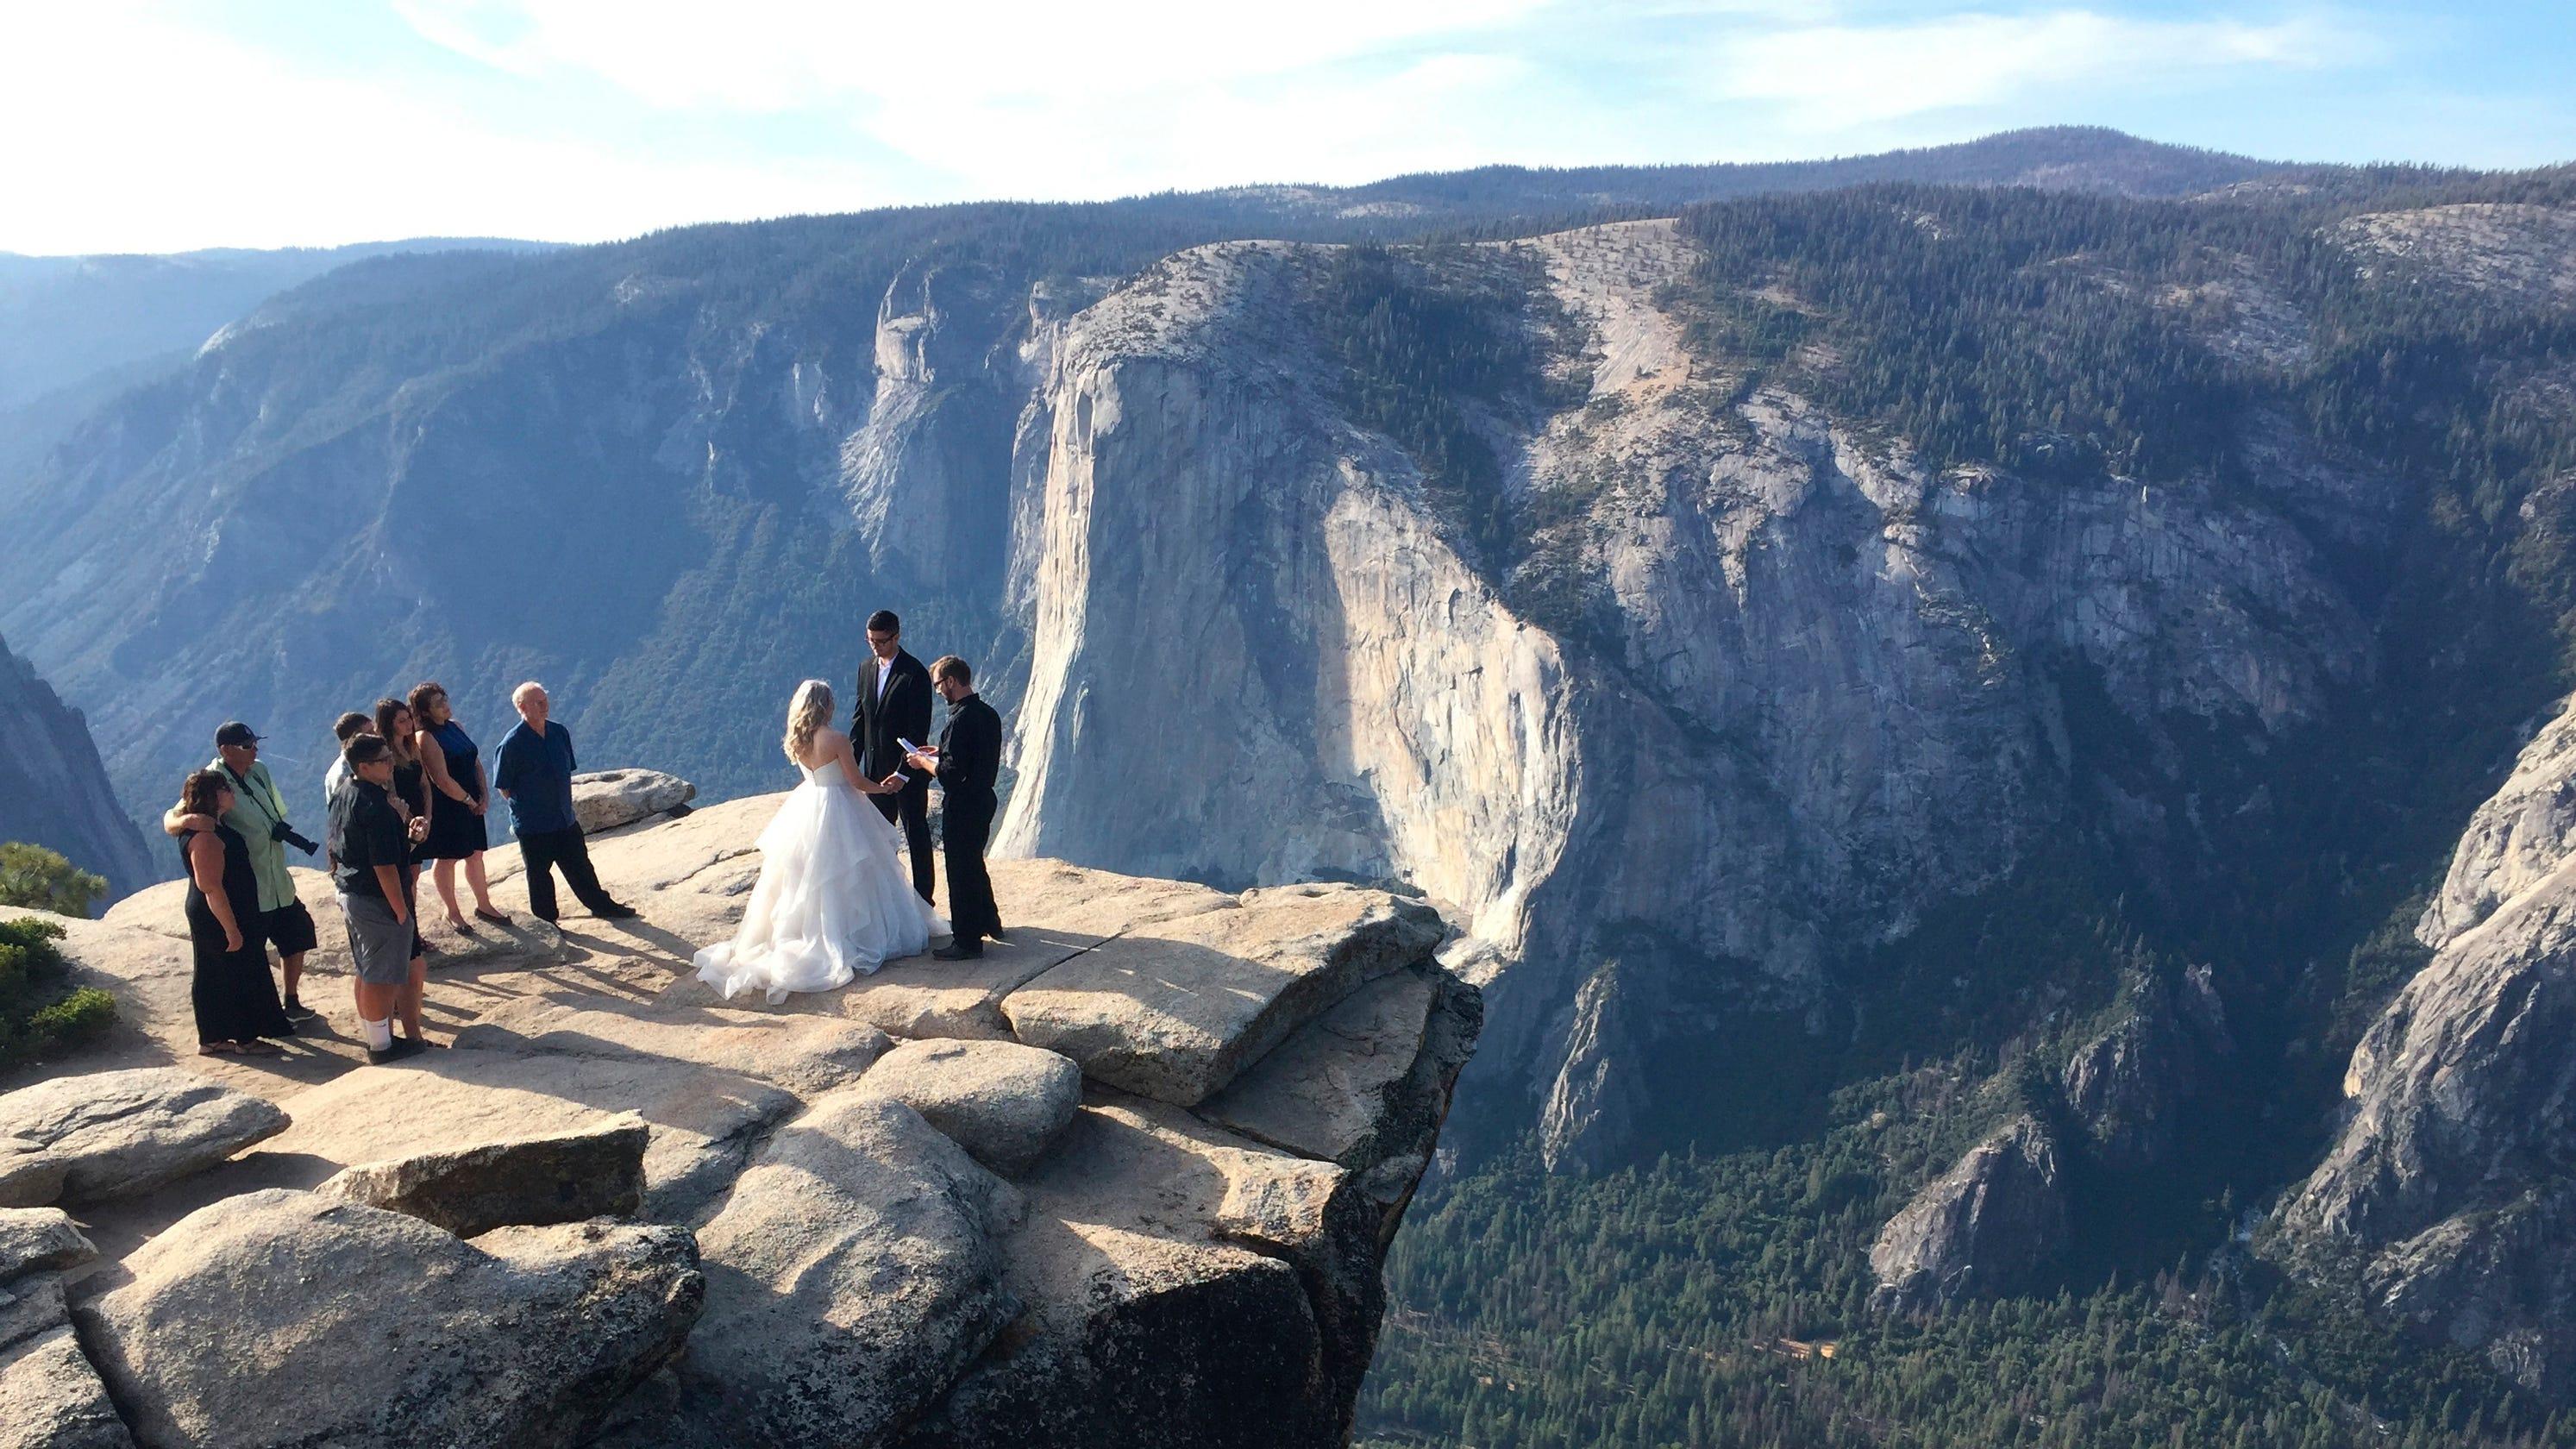 Yosemite deaths highlight danger behind those glorious